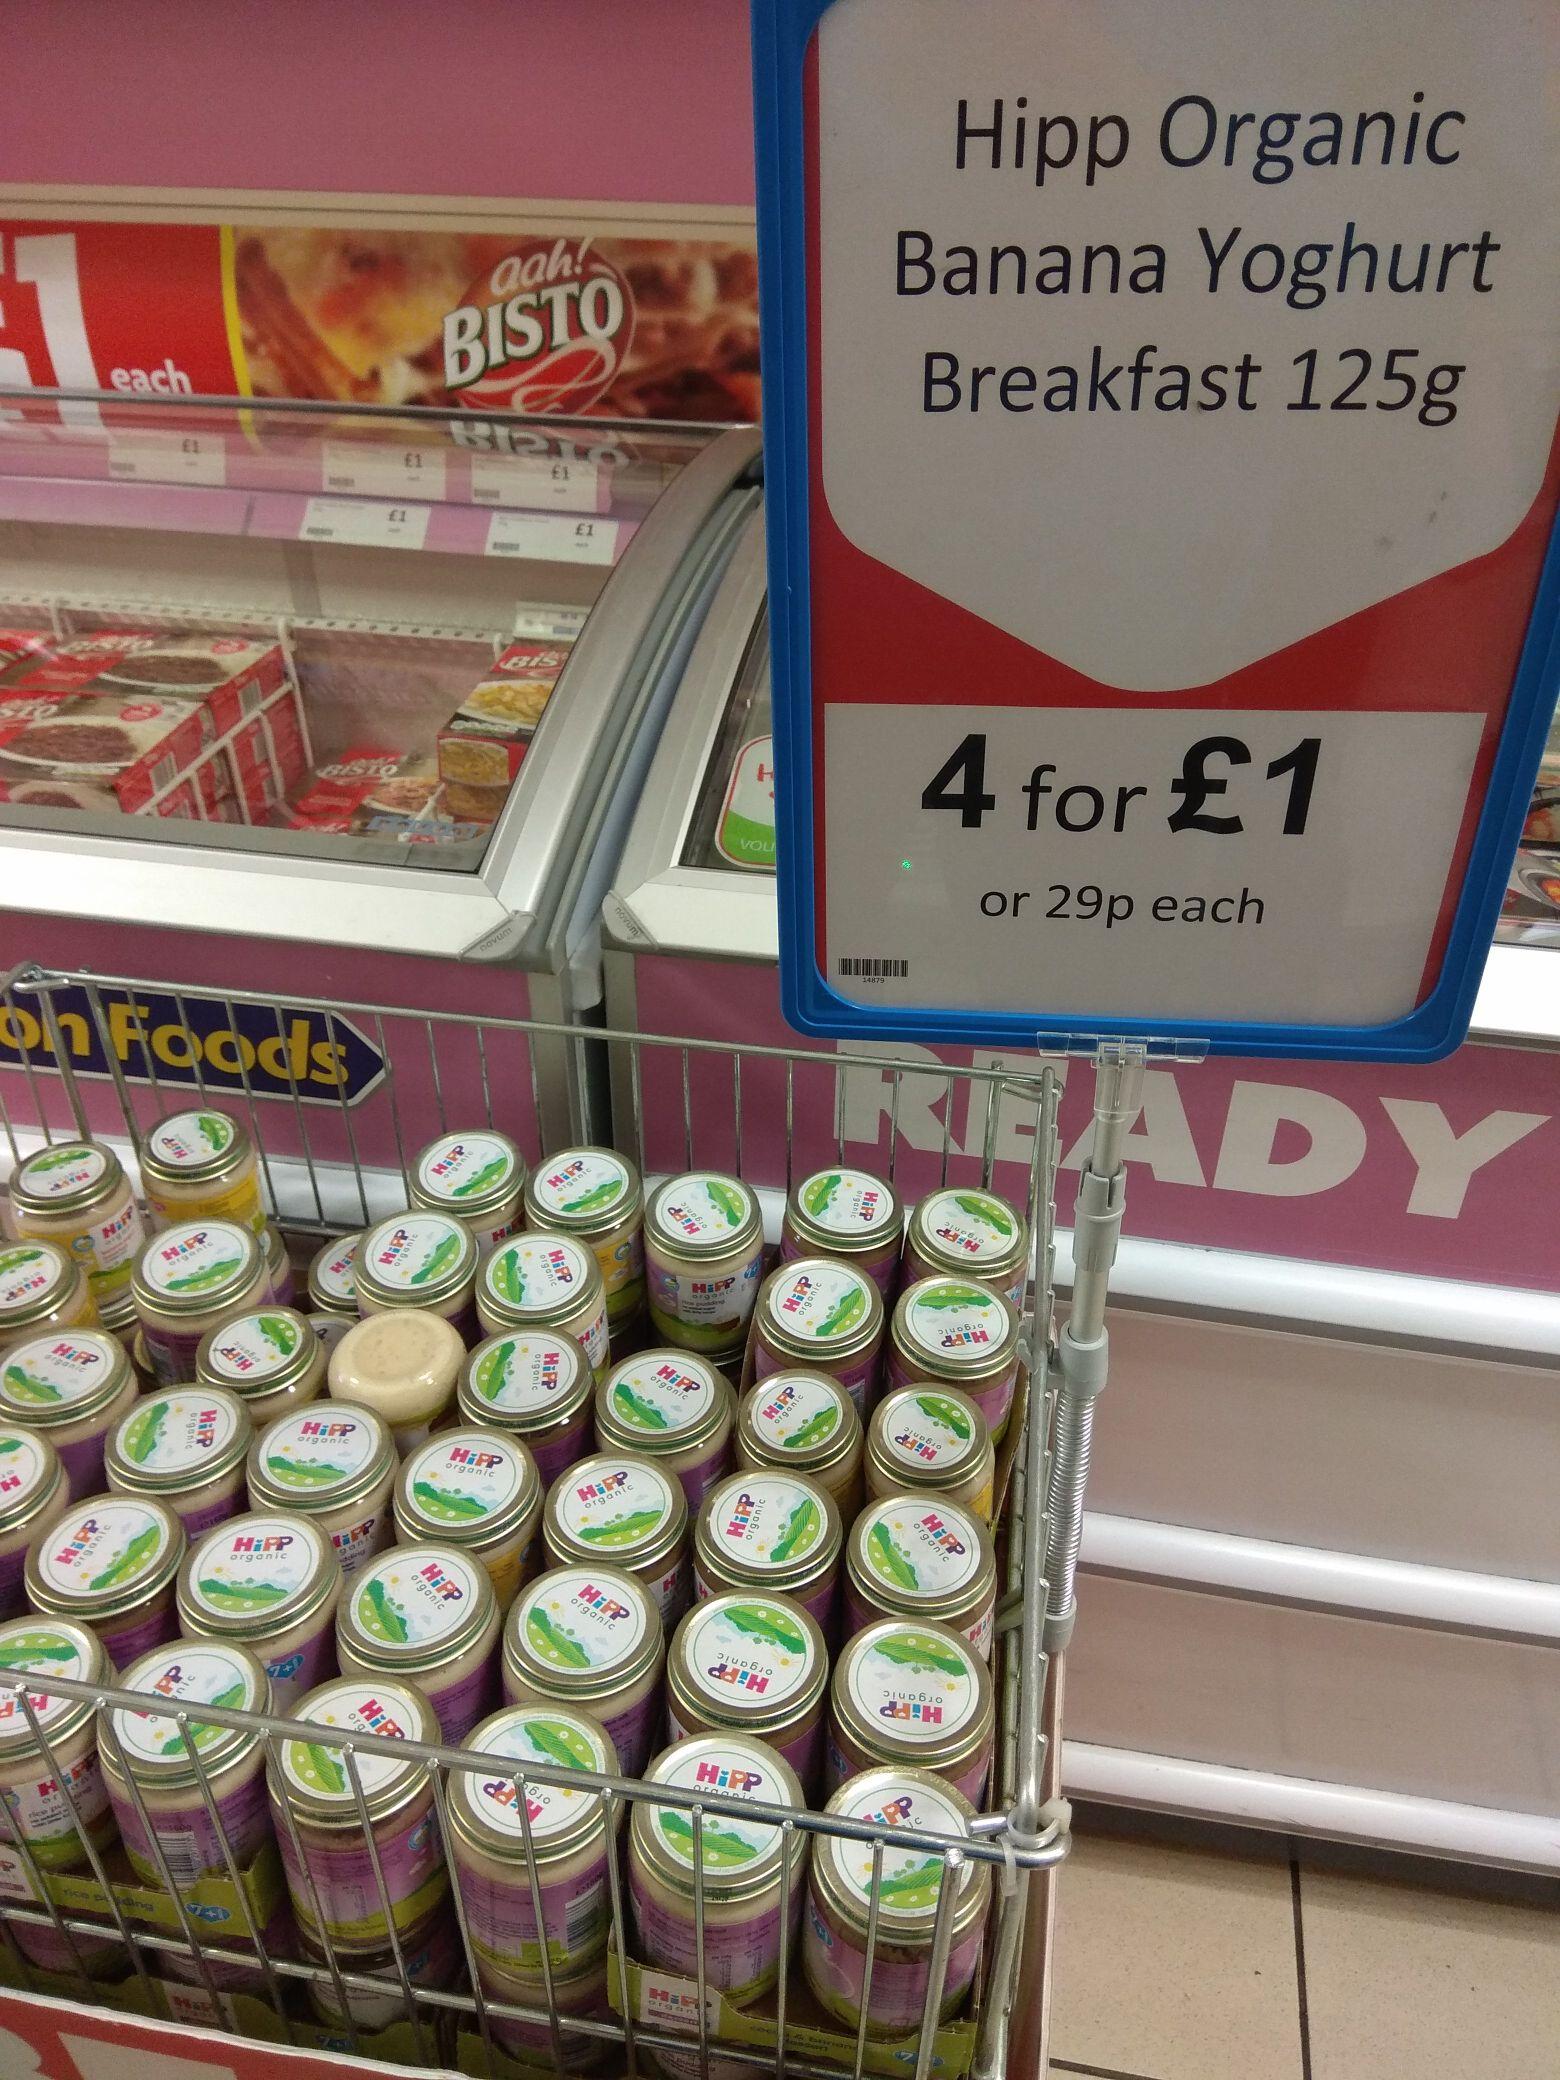 4 x Hipp Organic banana yoghurt breakfast 125g - £1 @ Heron foods